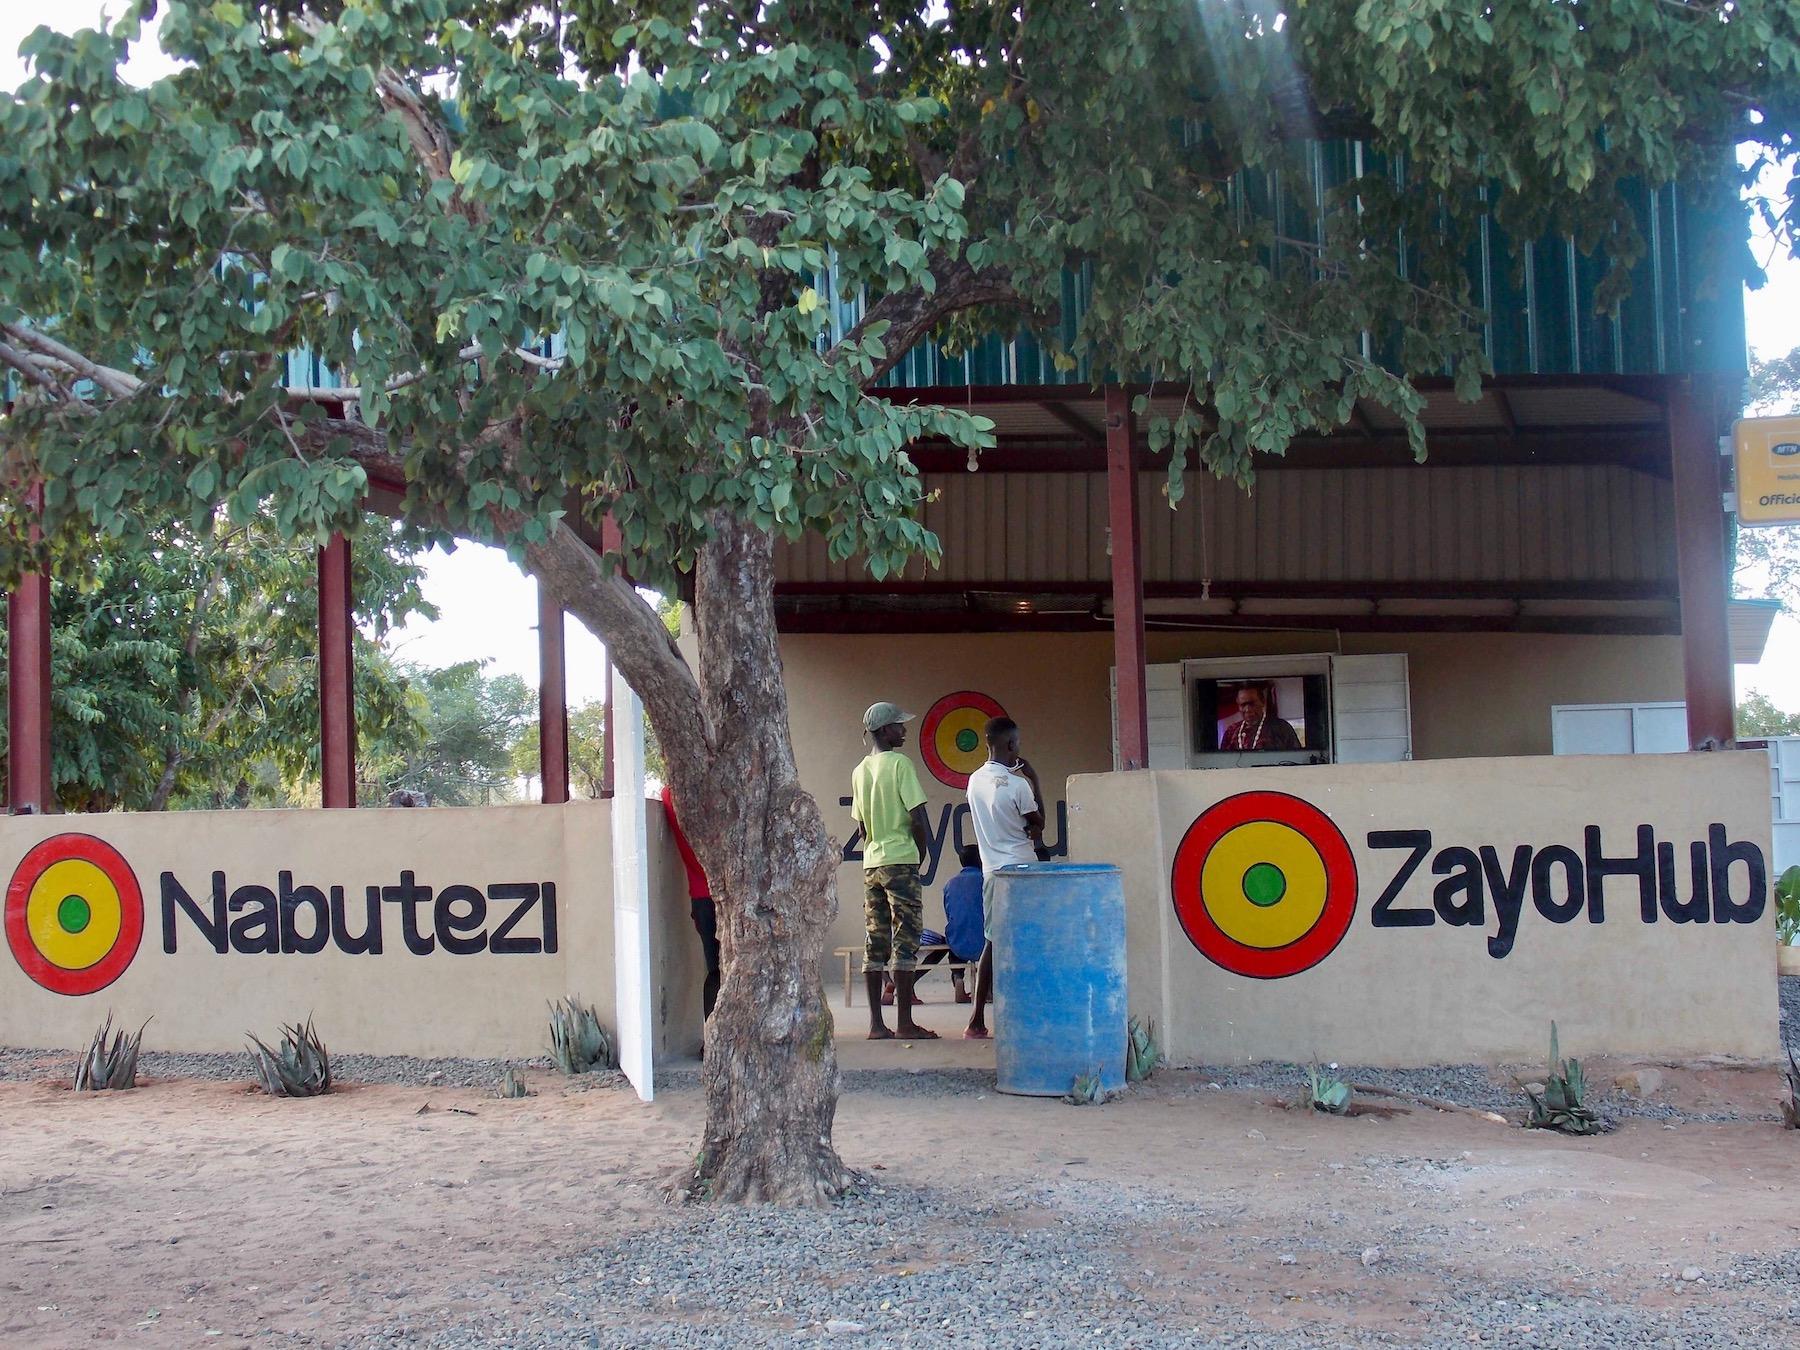 Nabutezi-zayohub-africa.jpg